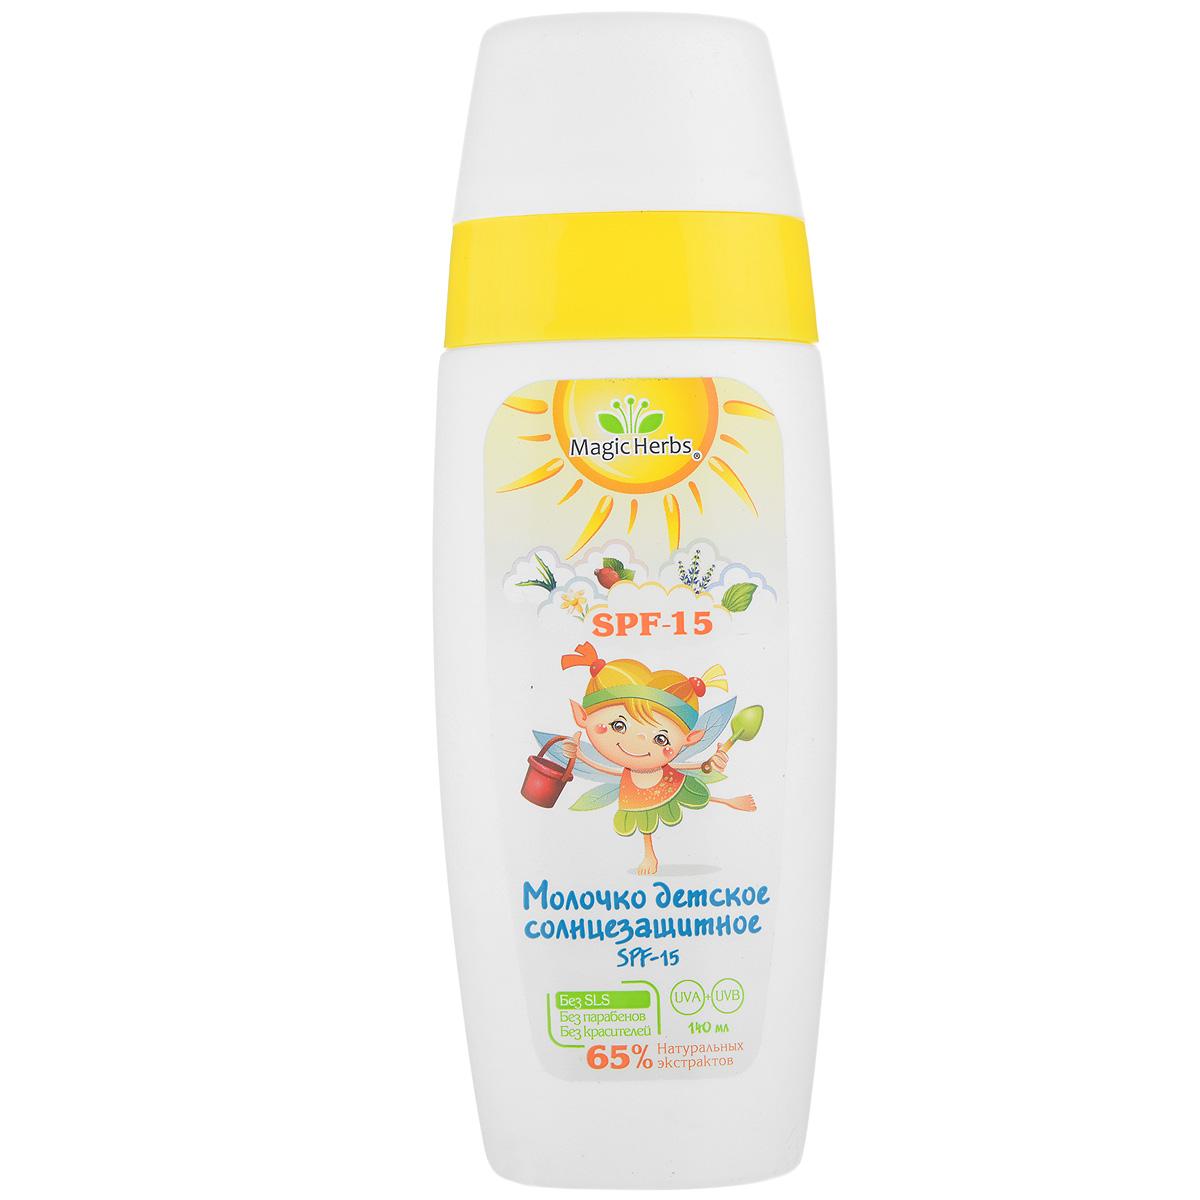 Magic Herbs Молочко детское солнцезащитное, SPF-15, 140 мл